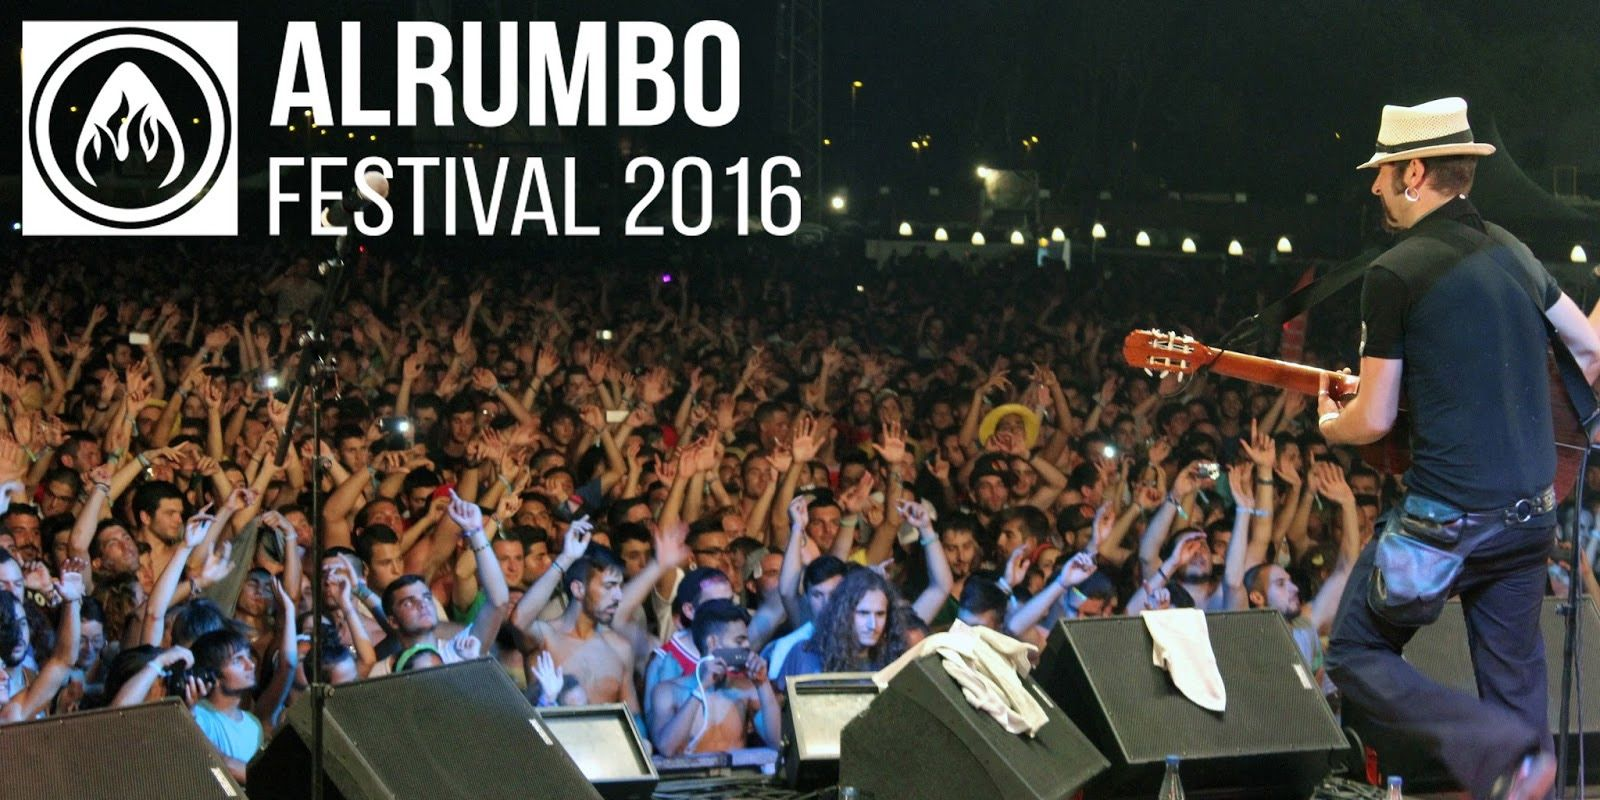 AlRumbo Festival 2016 1